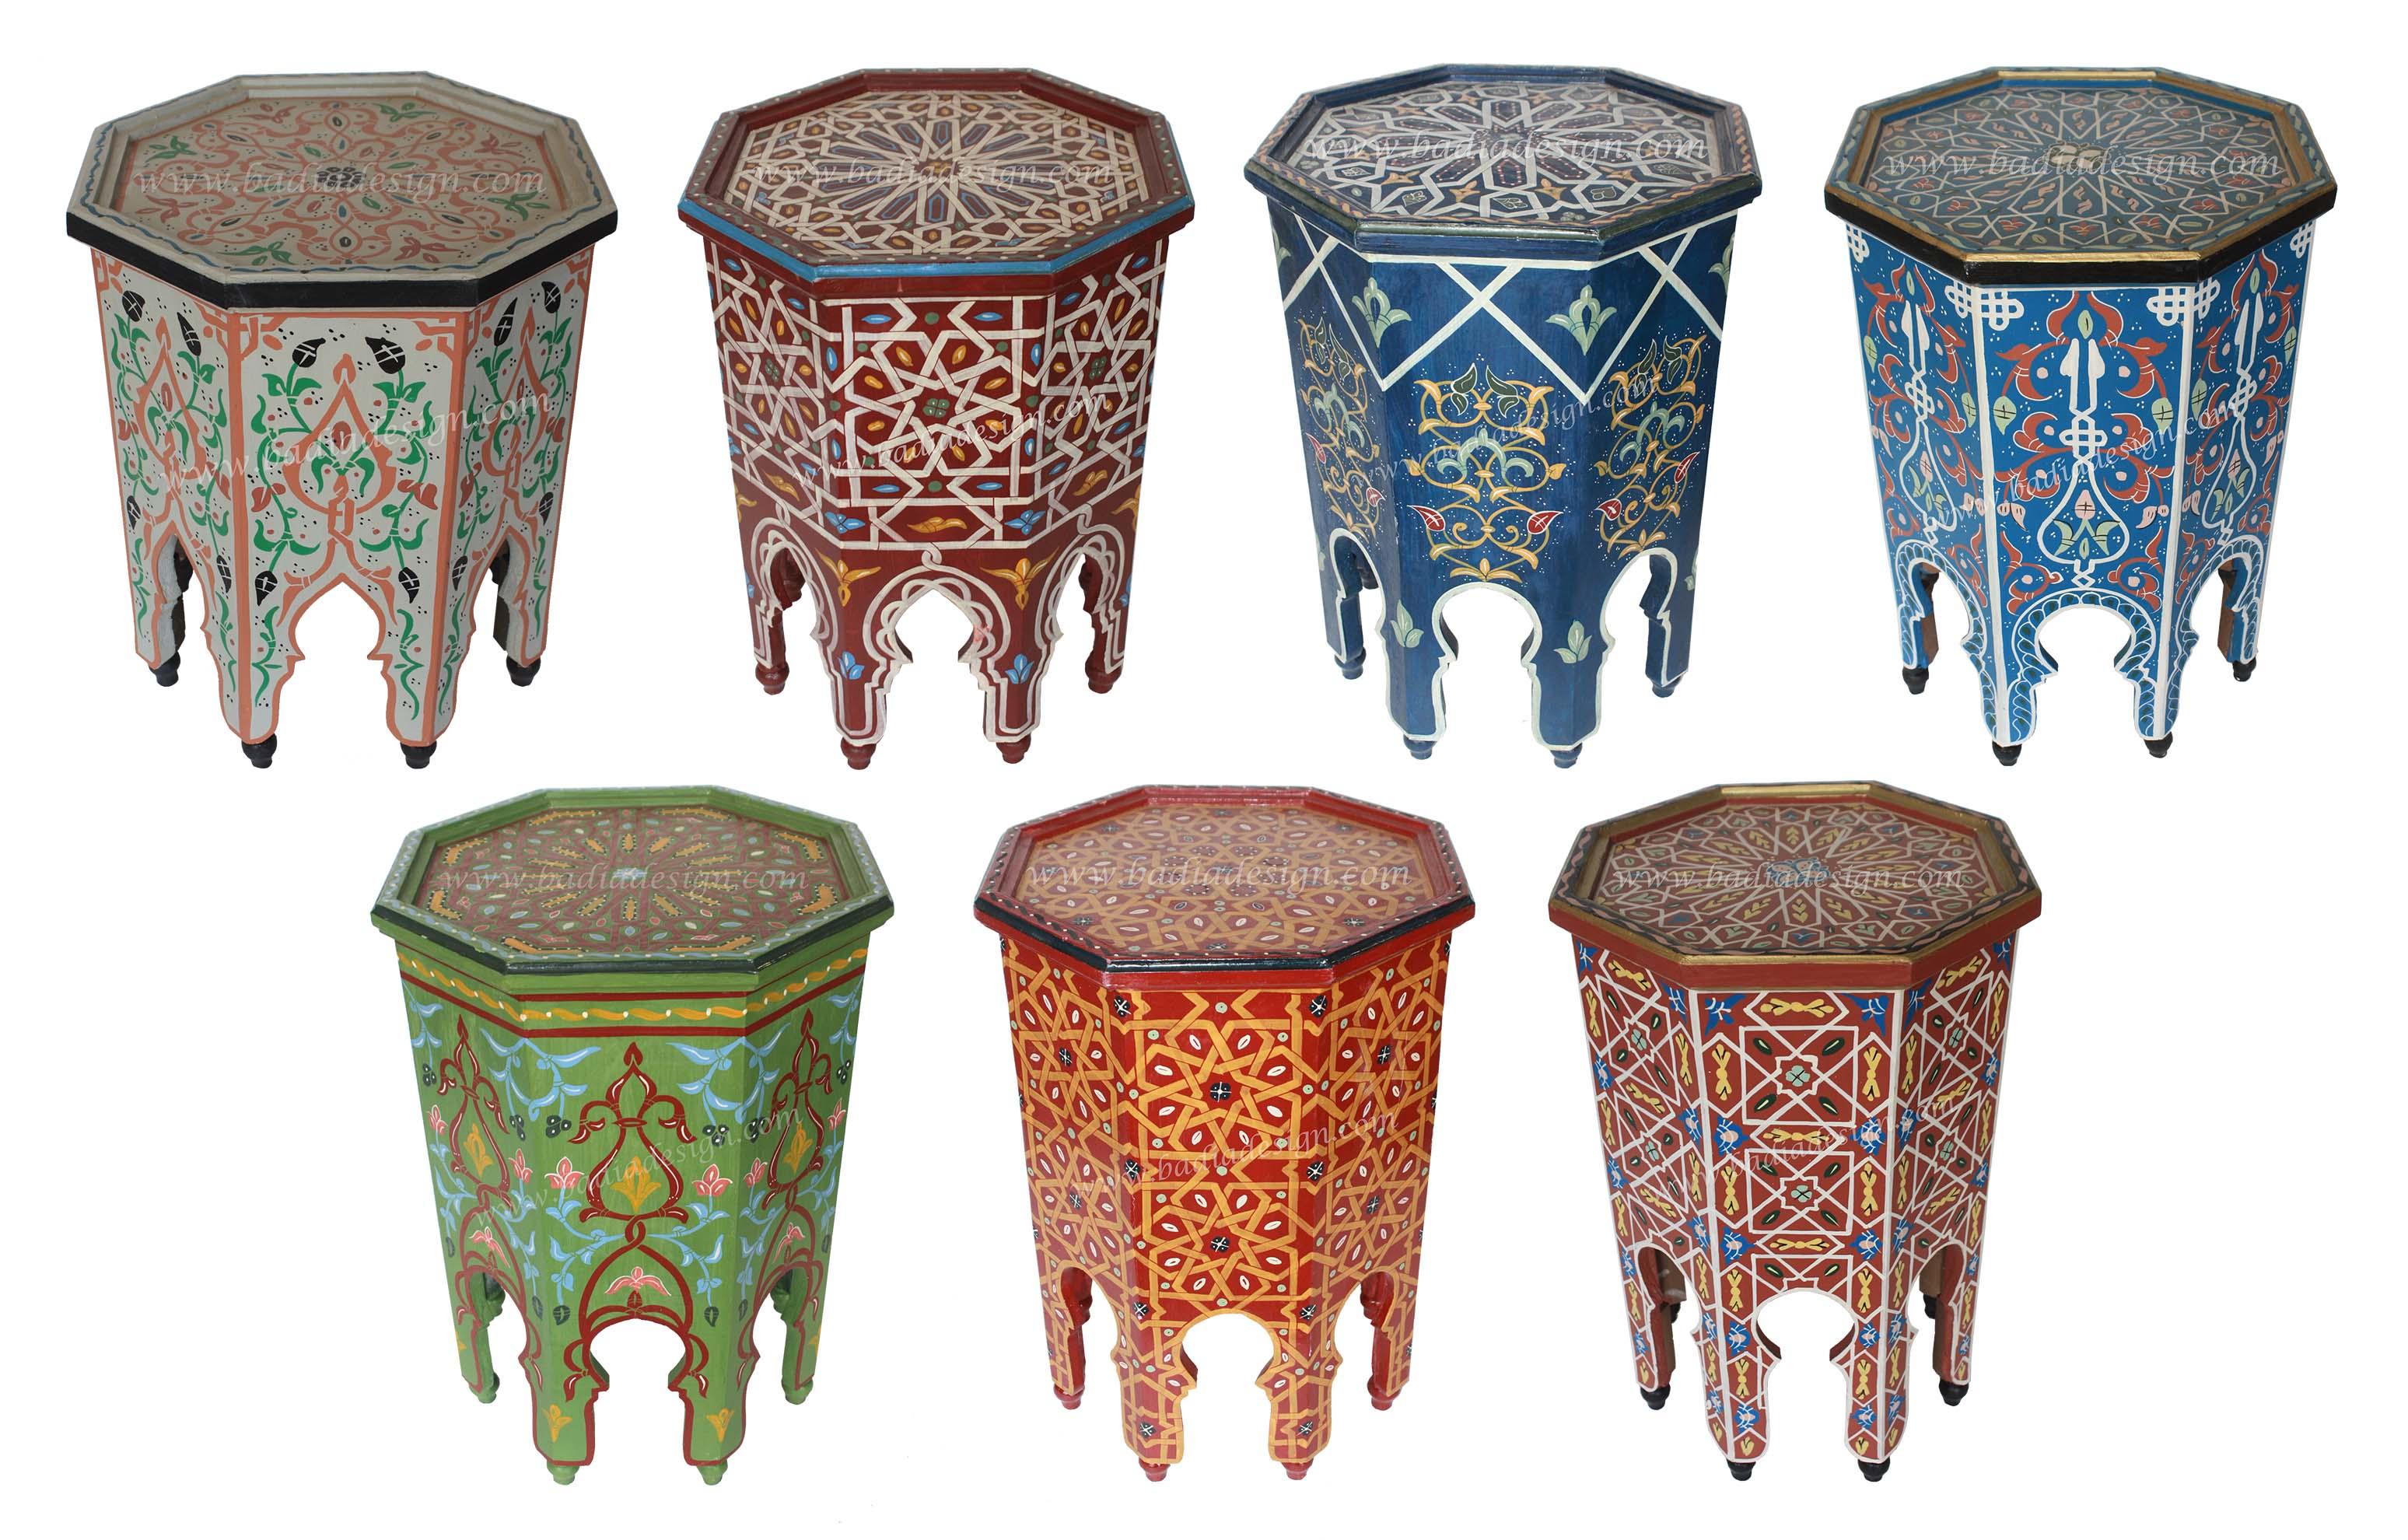 moroccan-painted-side-table-hp010.jpg